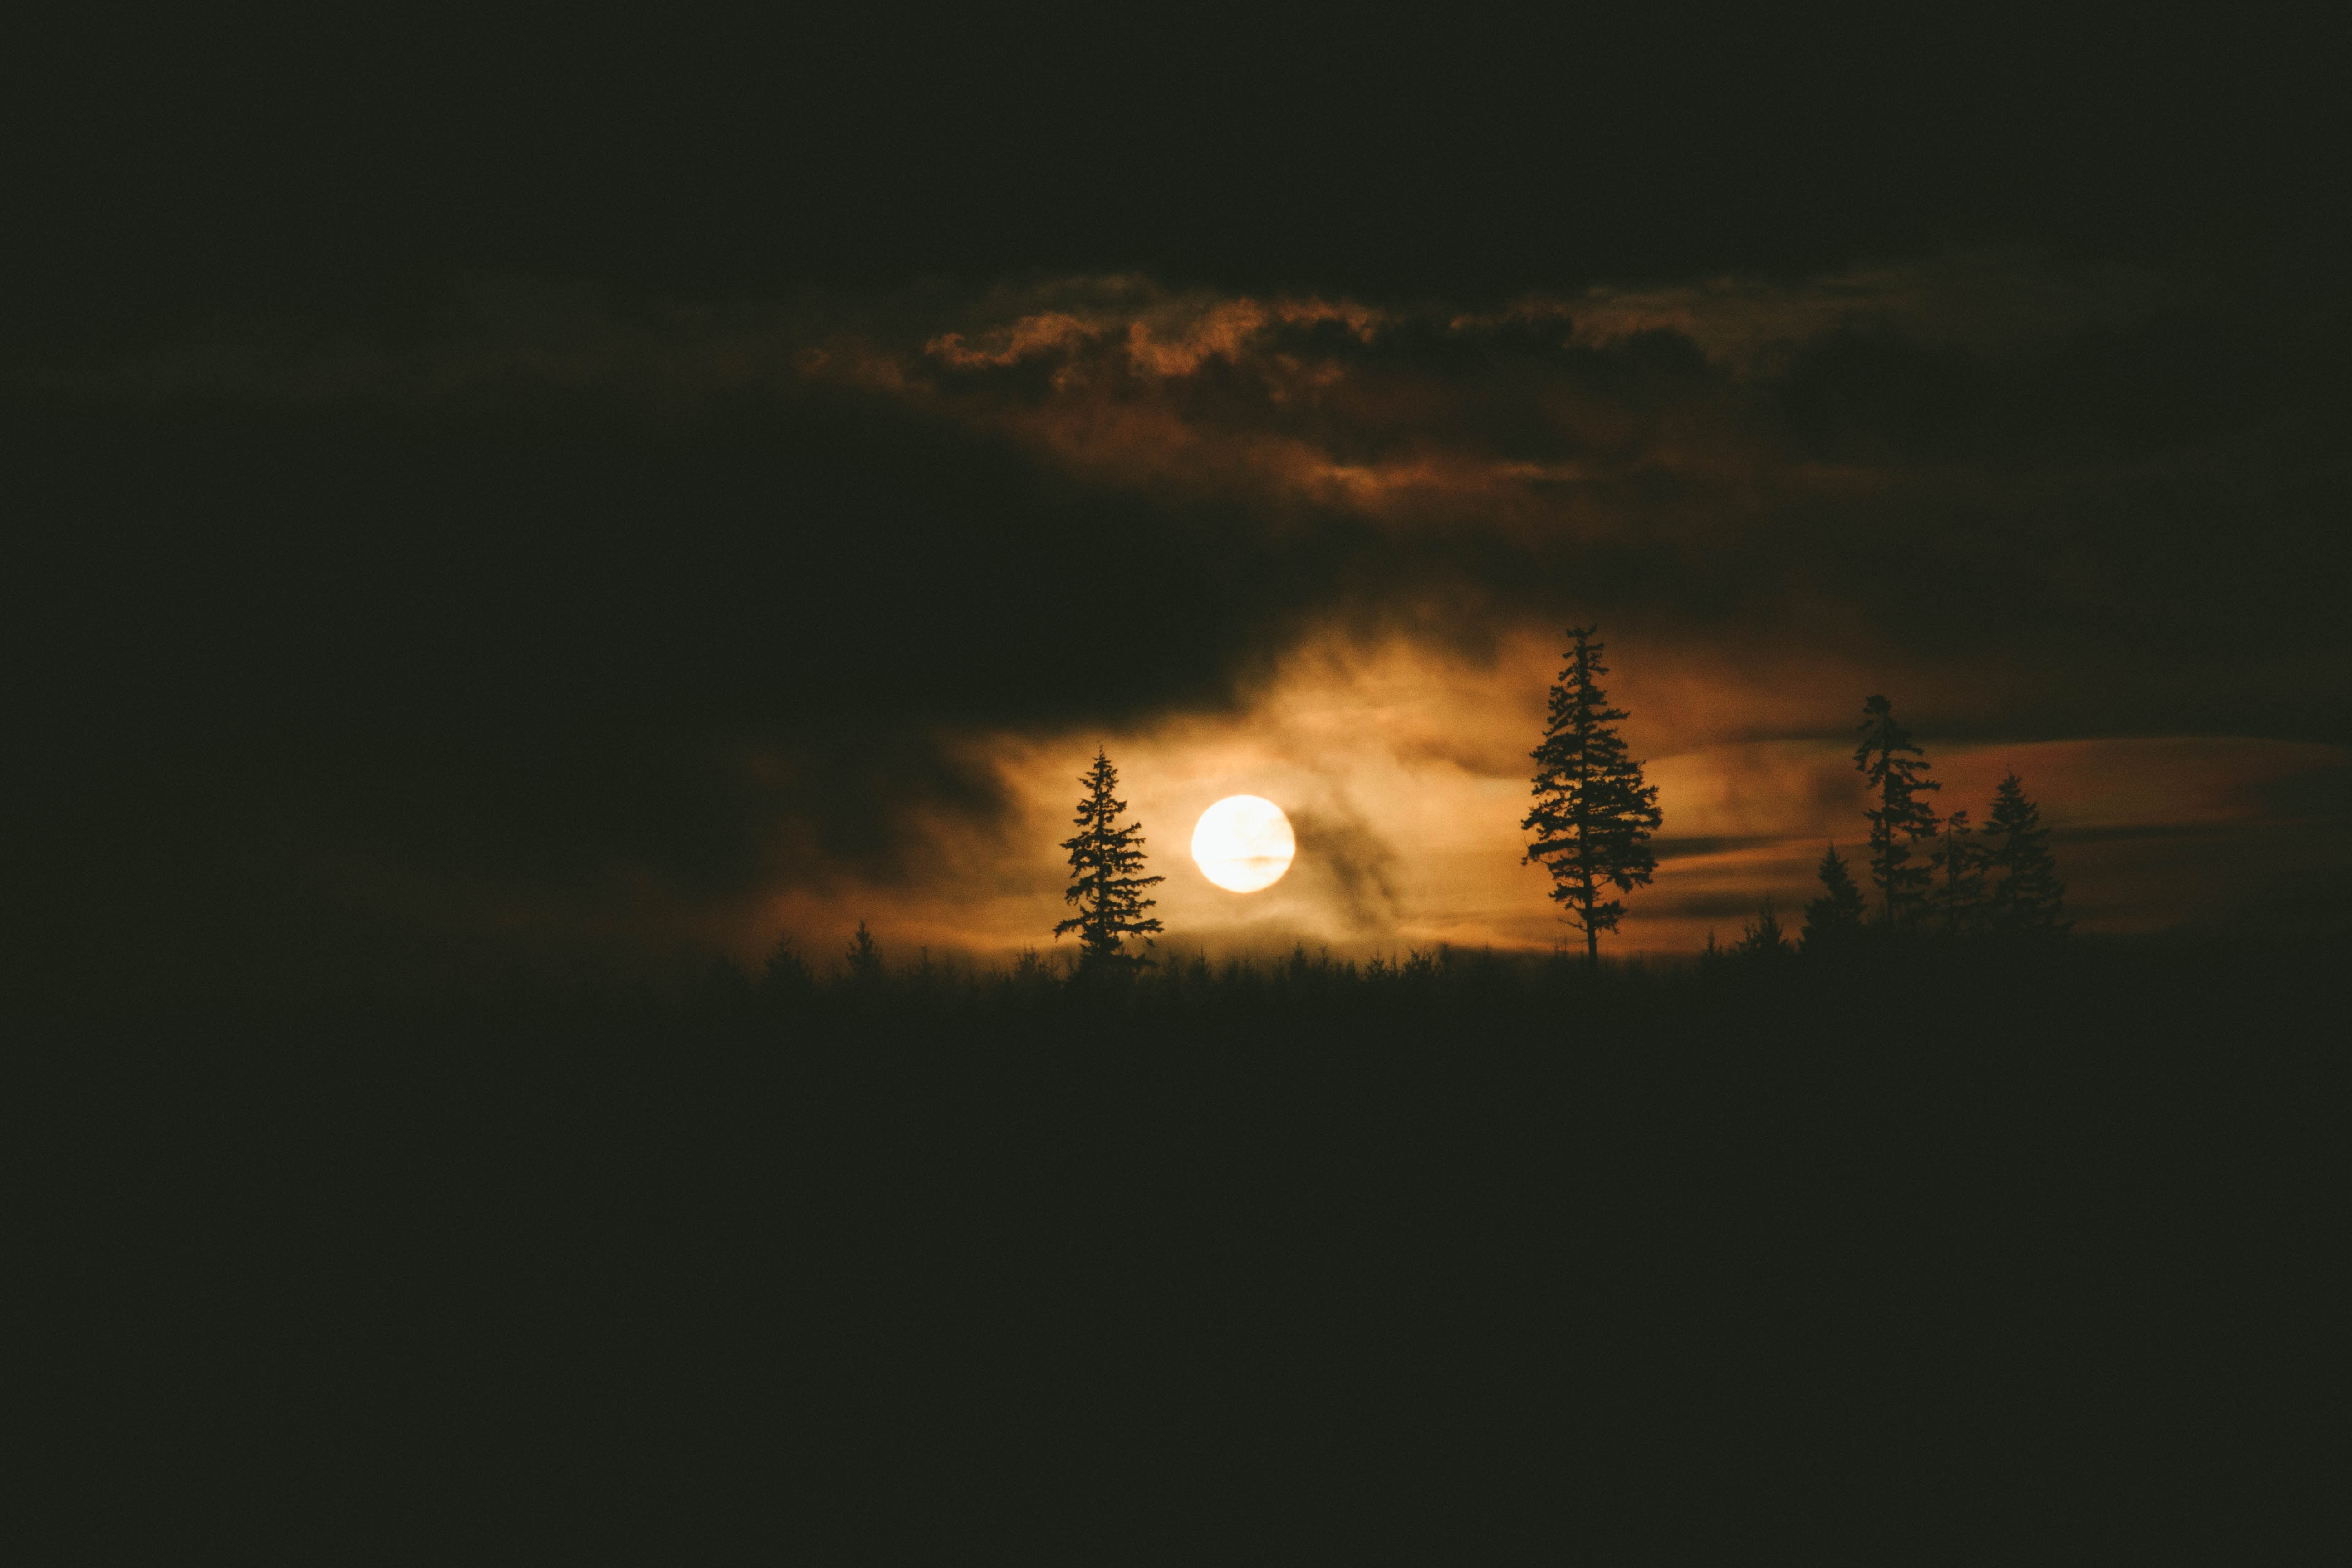 f:id:moonribar:20170717225824j:image